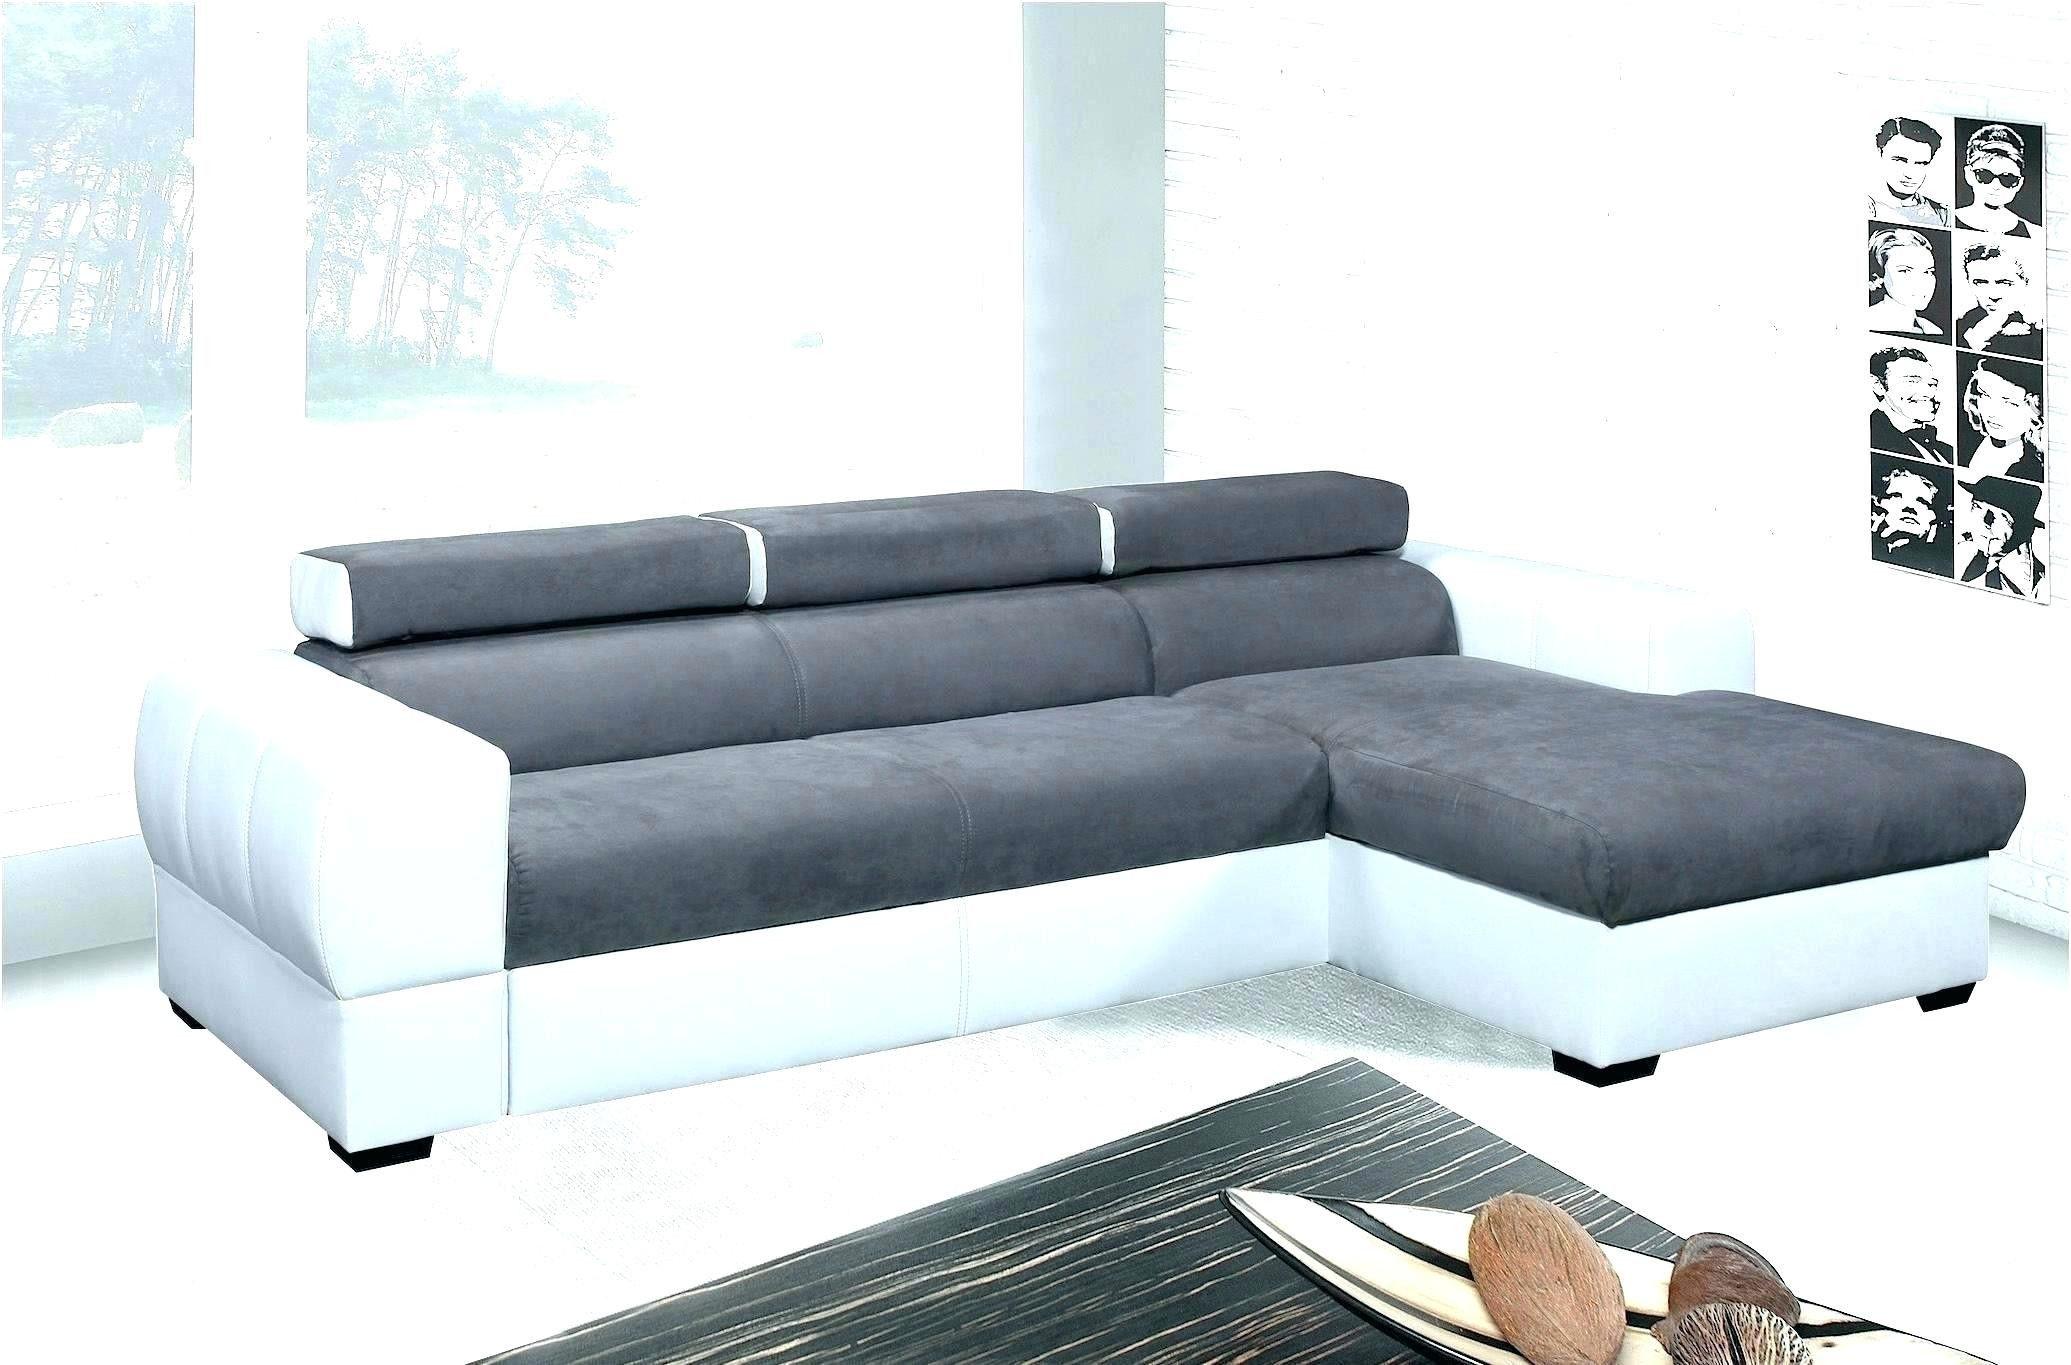 35 Meilleur Cinna Canape Idees Astucieuses Cinna Canape Furniture Couch Canape Salon